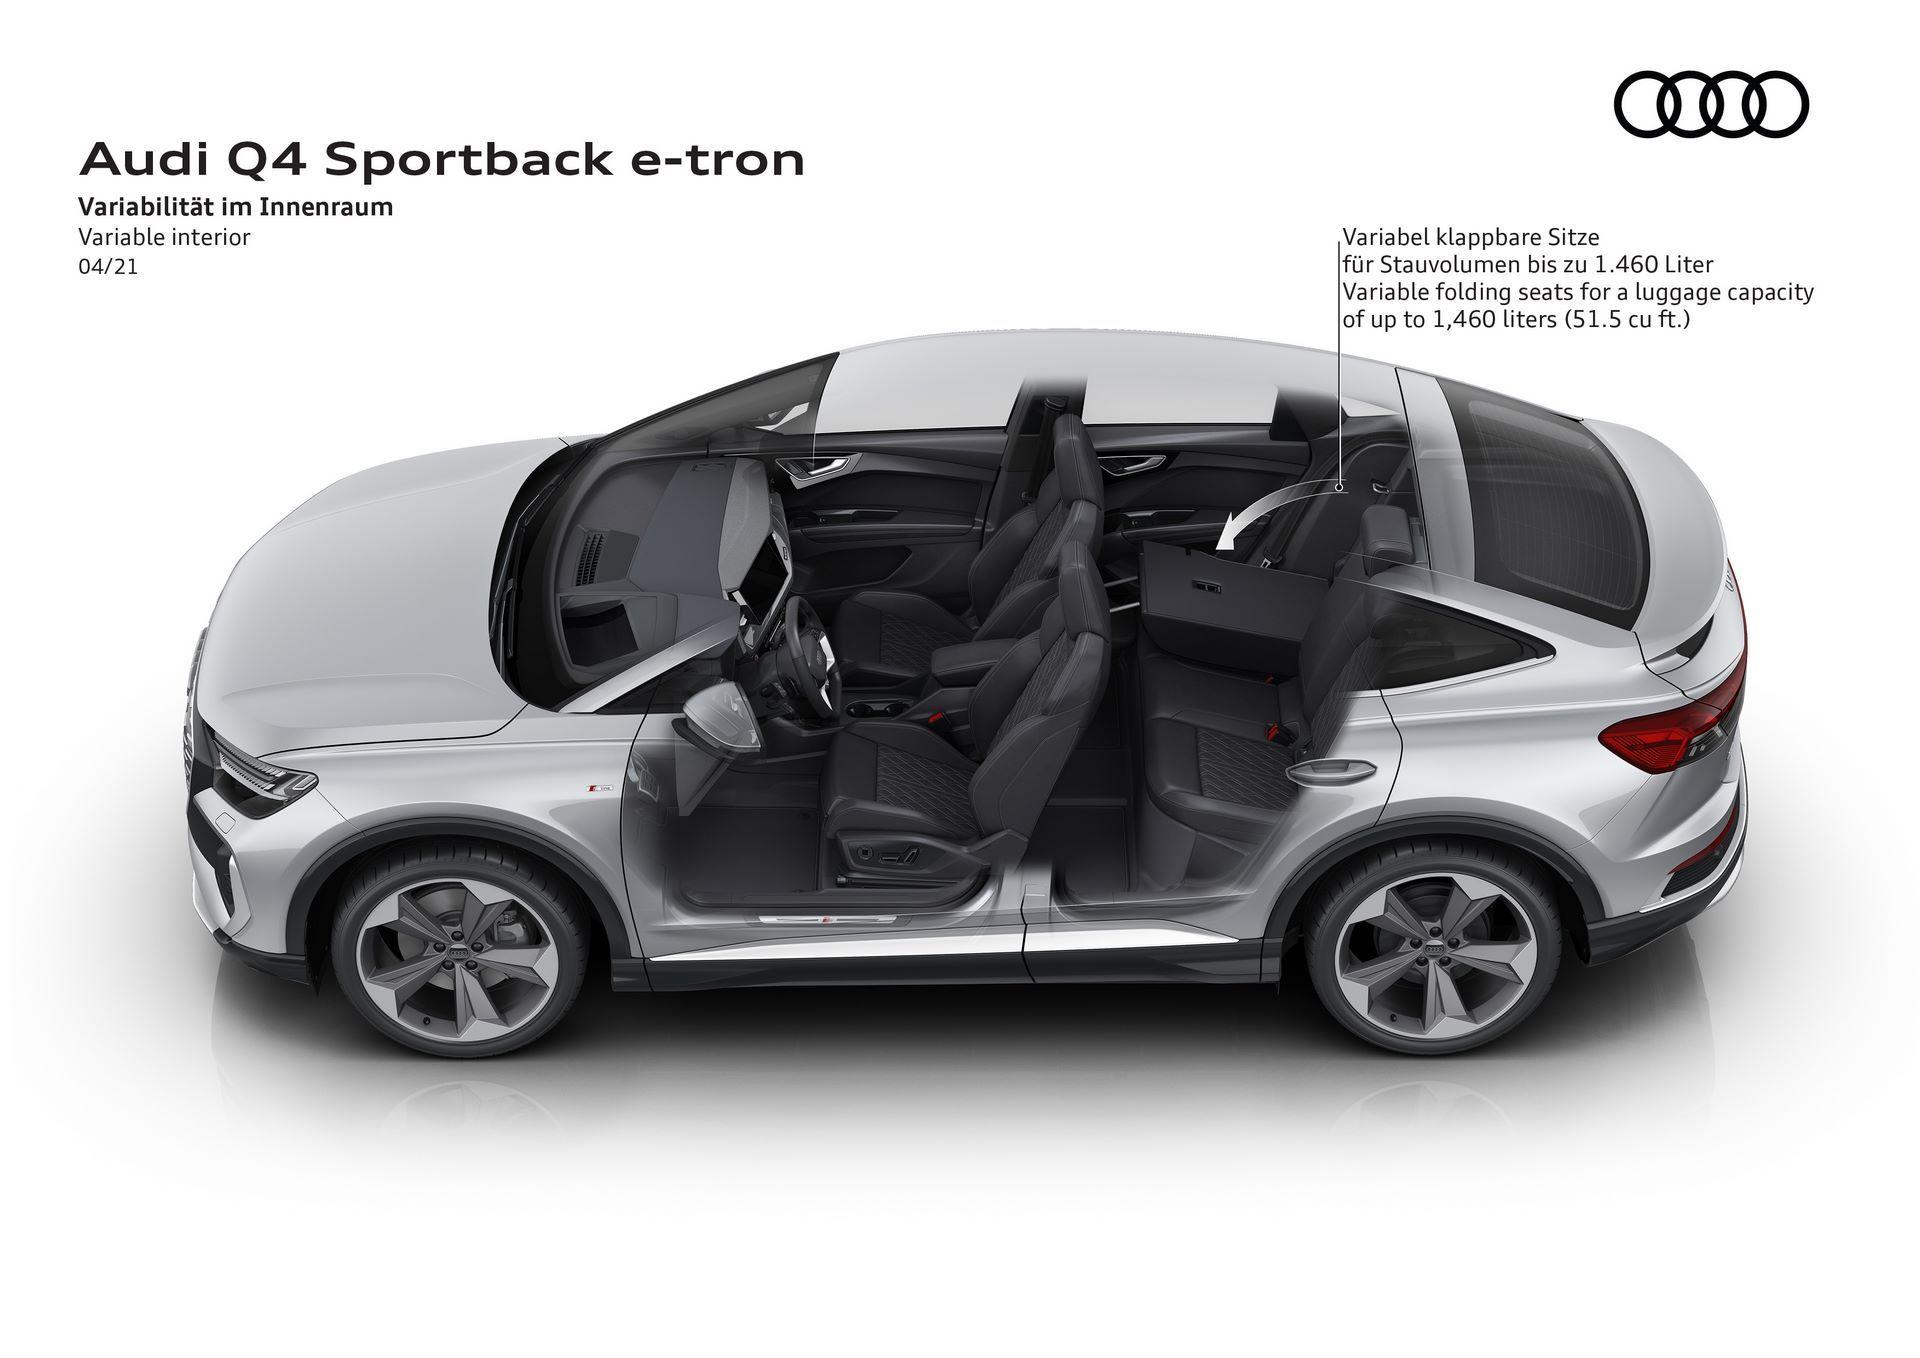 Audi-Q4-e-tron-and-Q4-e-tron-Sportback-143